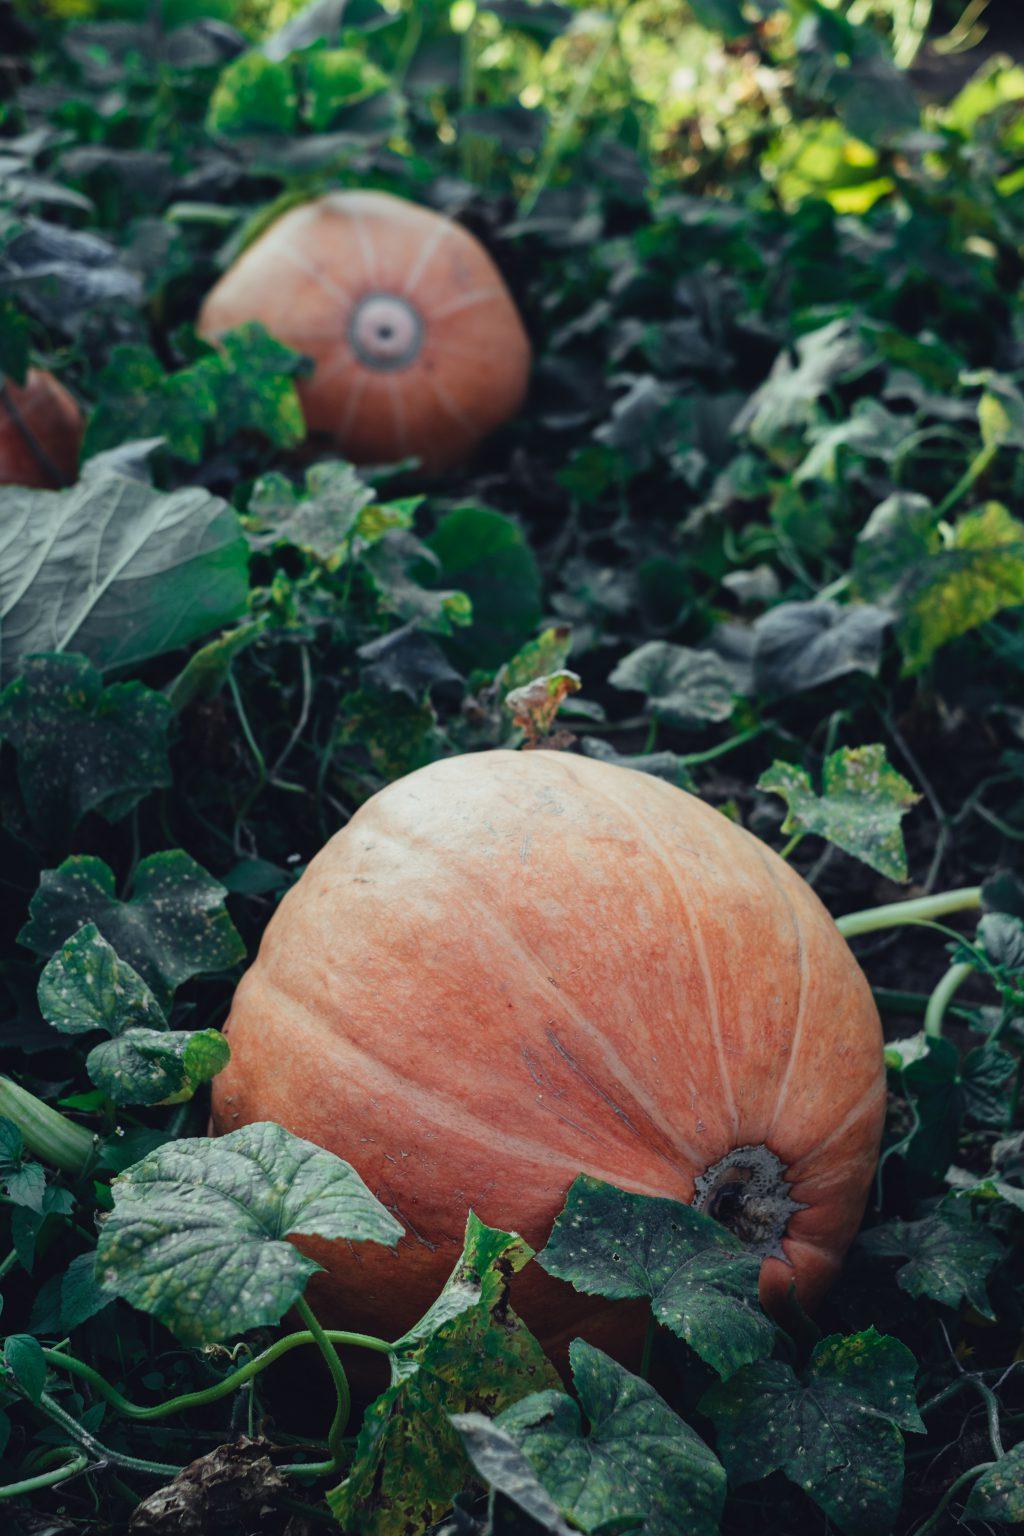 Orange pumpkins in the garden faded - free stock photo